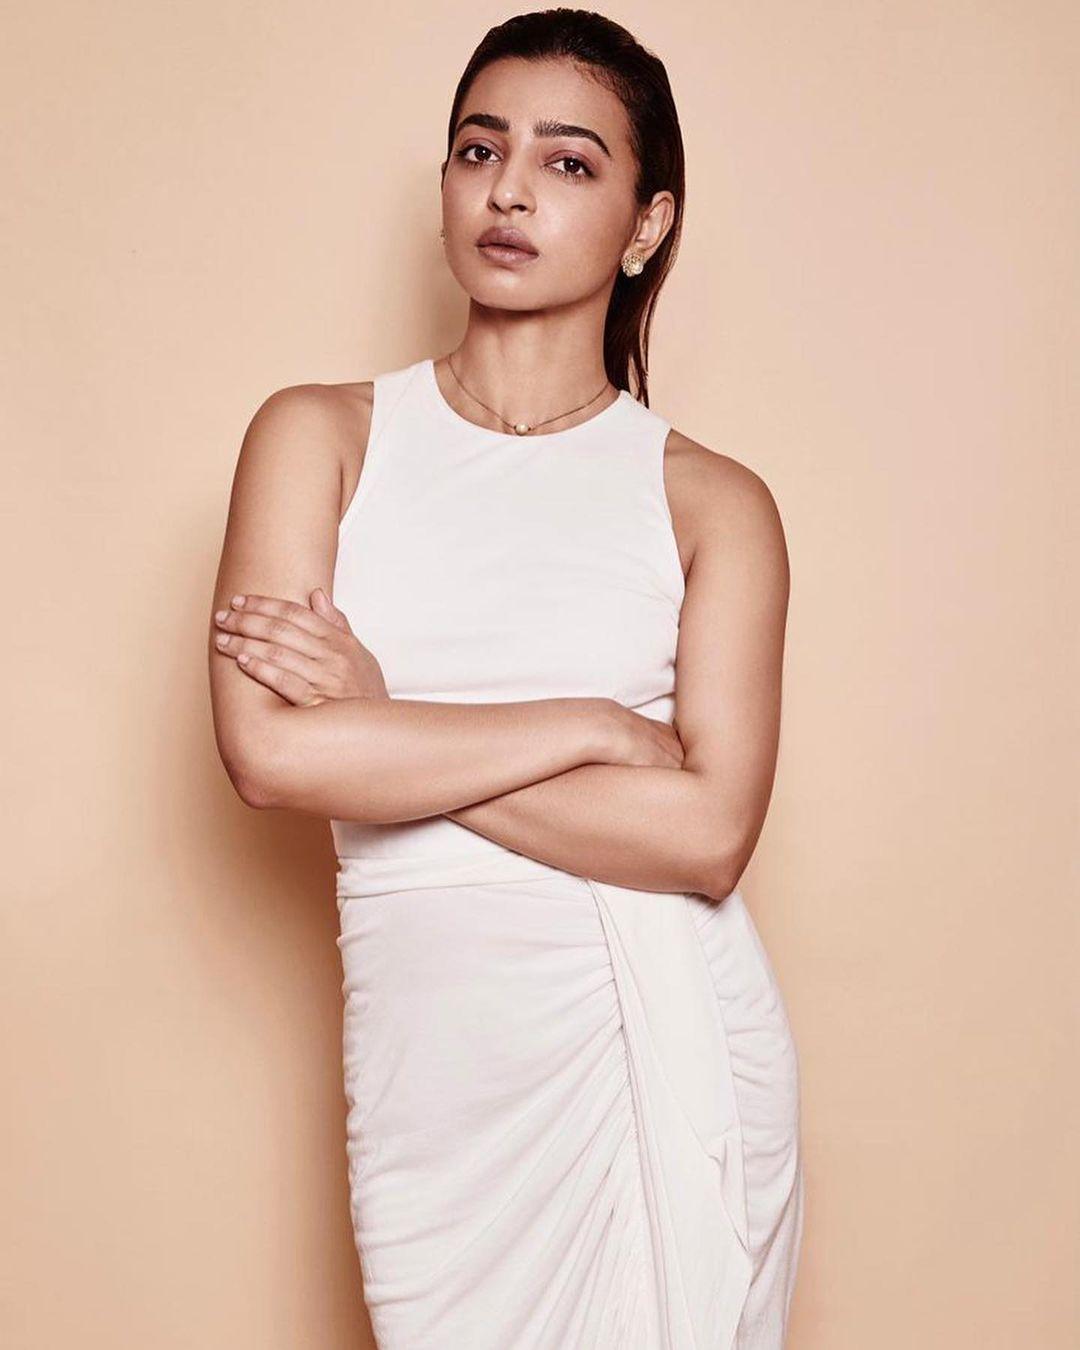 Radhika Apte feeling after photos leaked